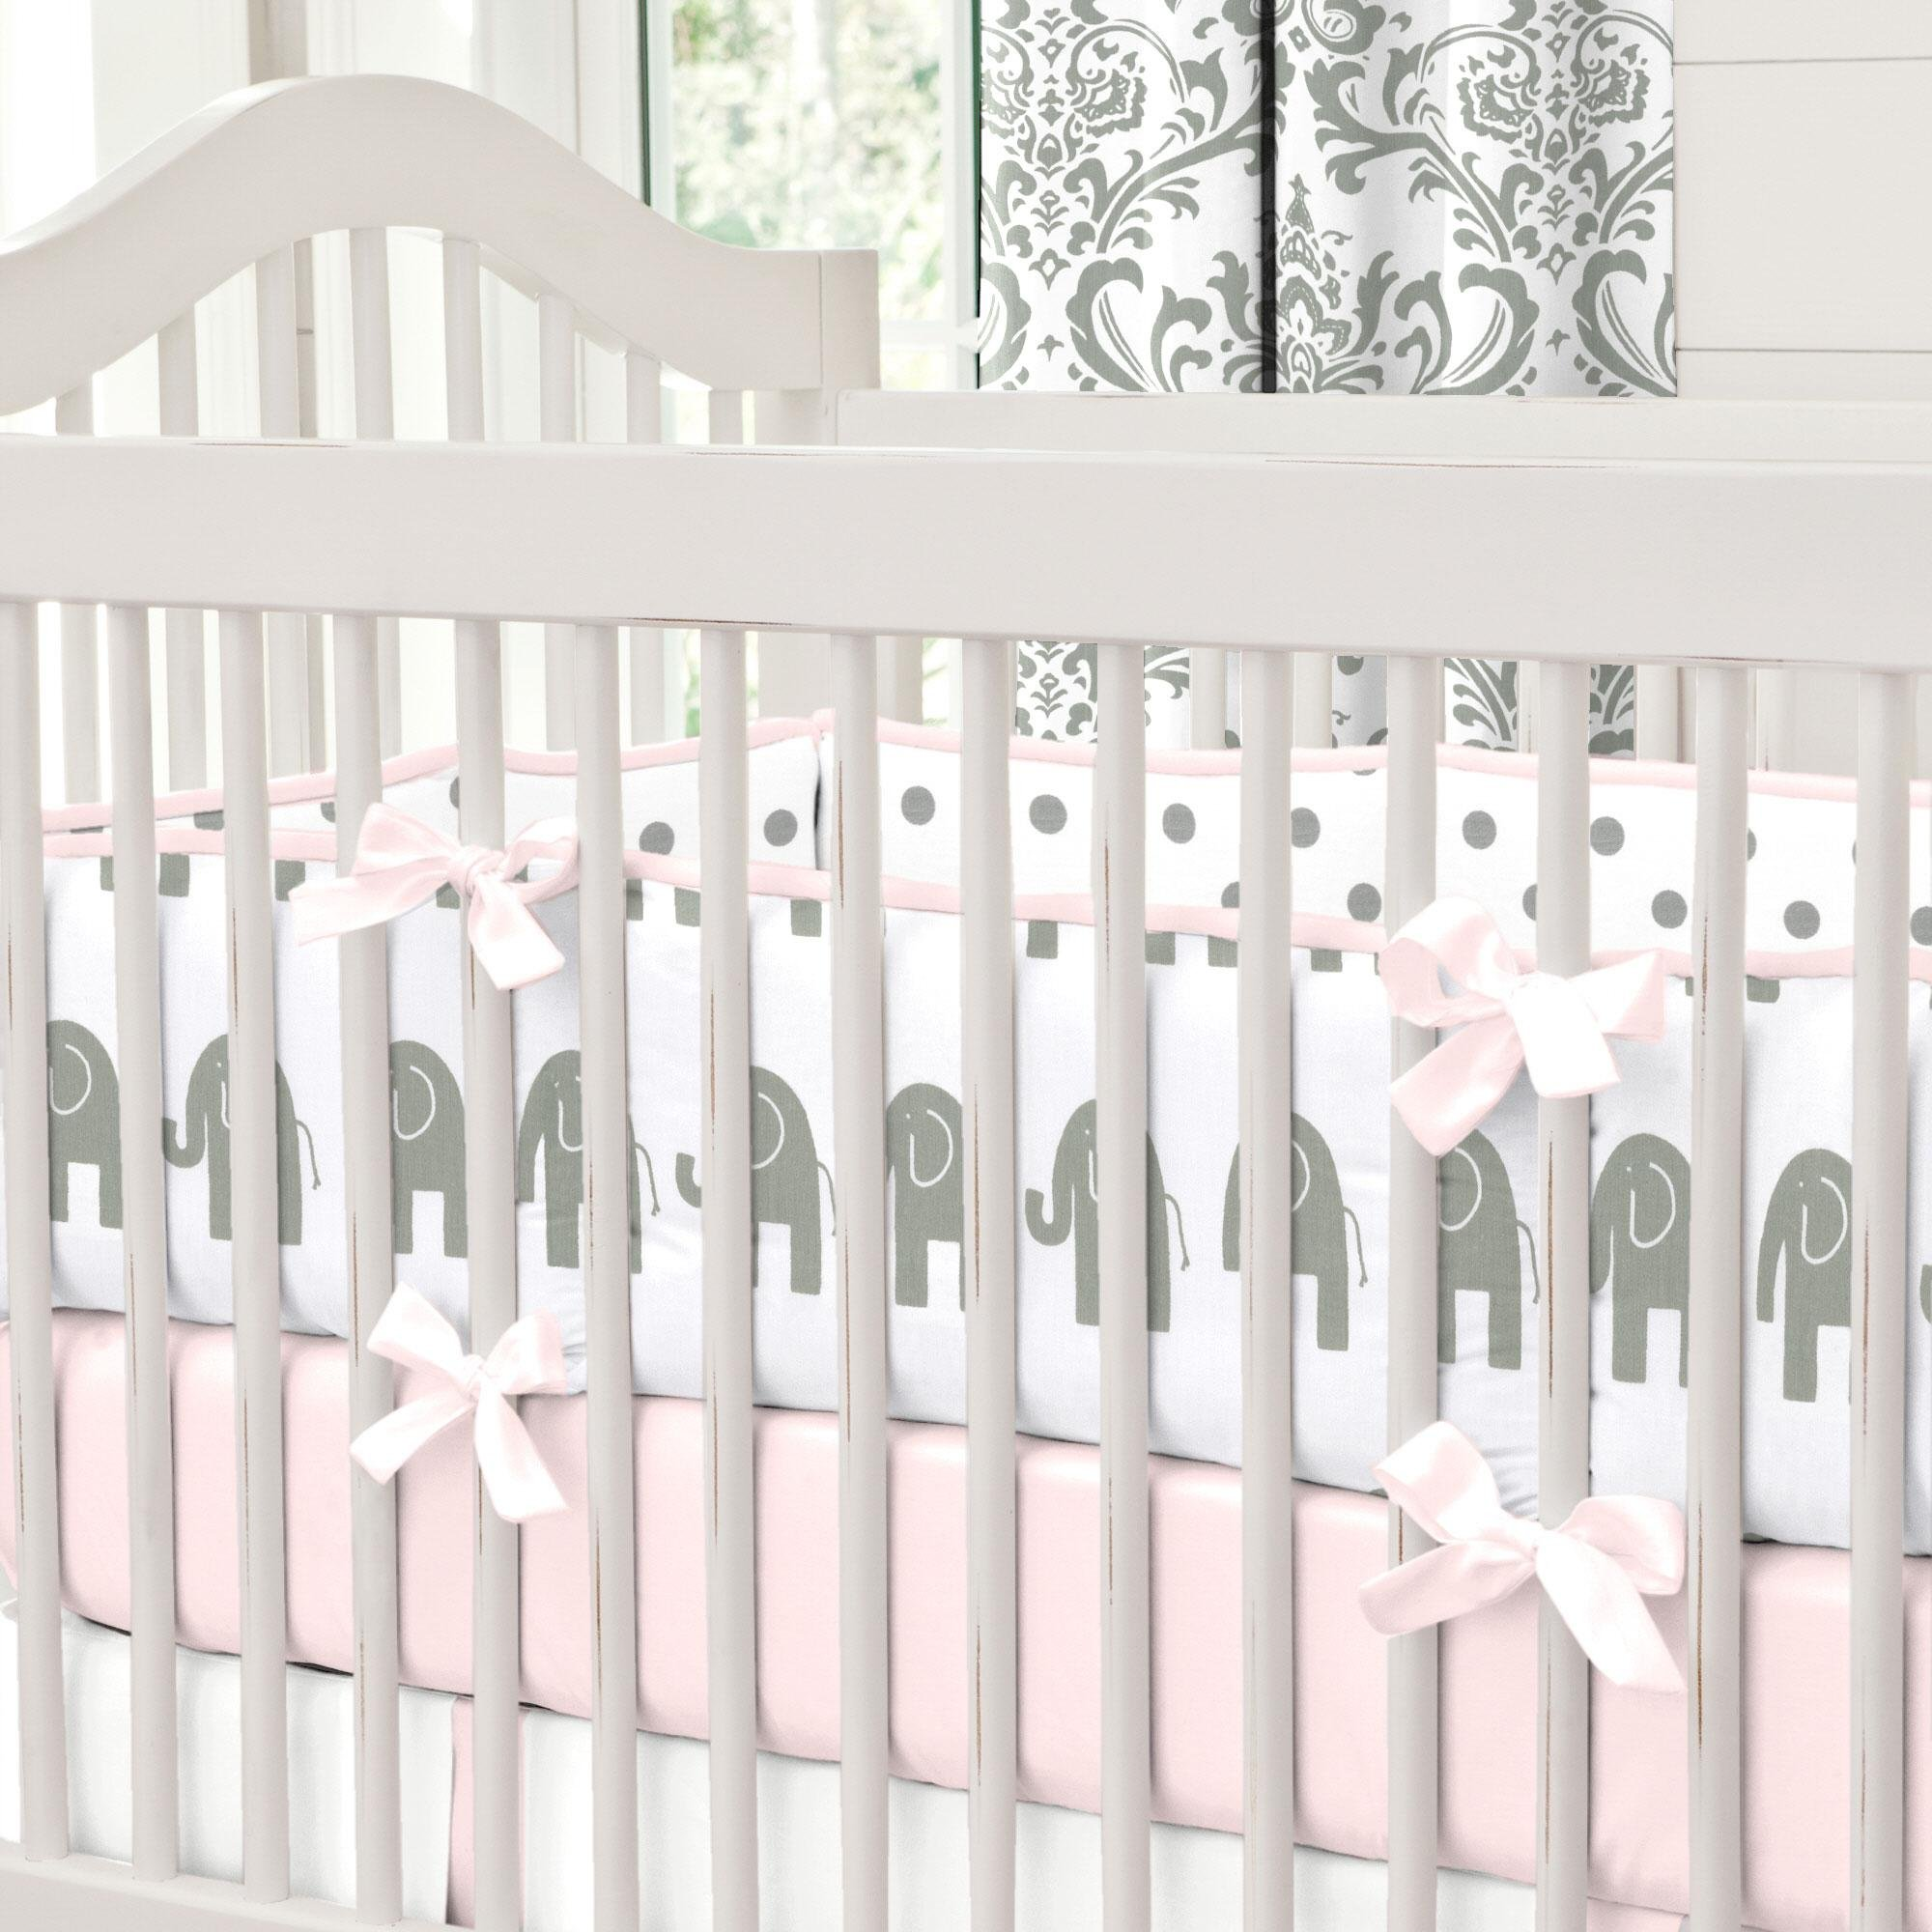 Carousel Designs Pink and Gray Elephants Crib Bumper